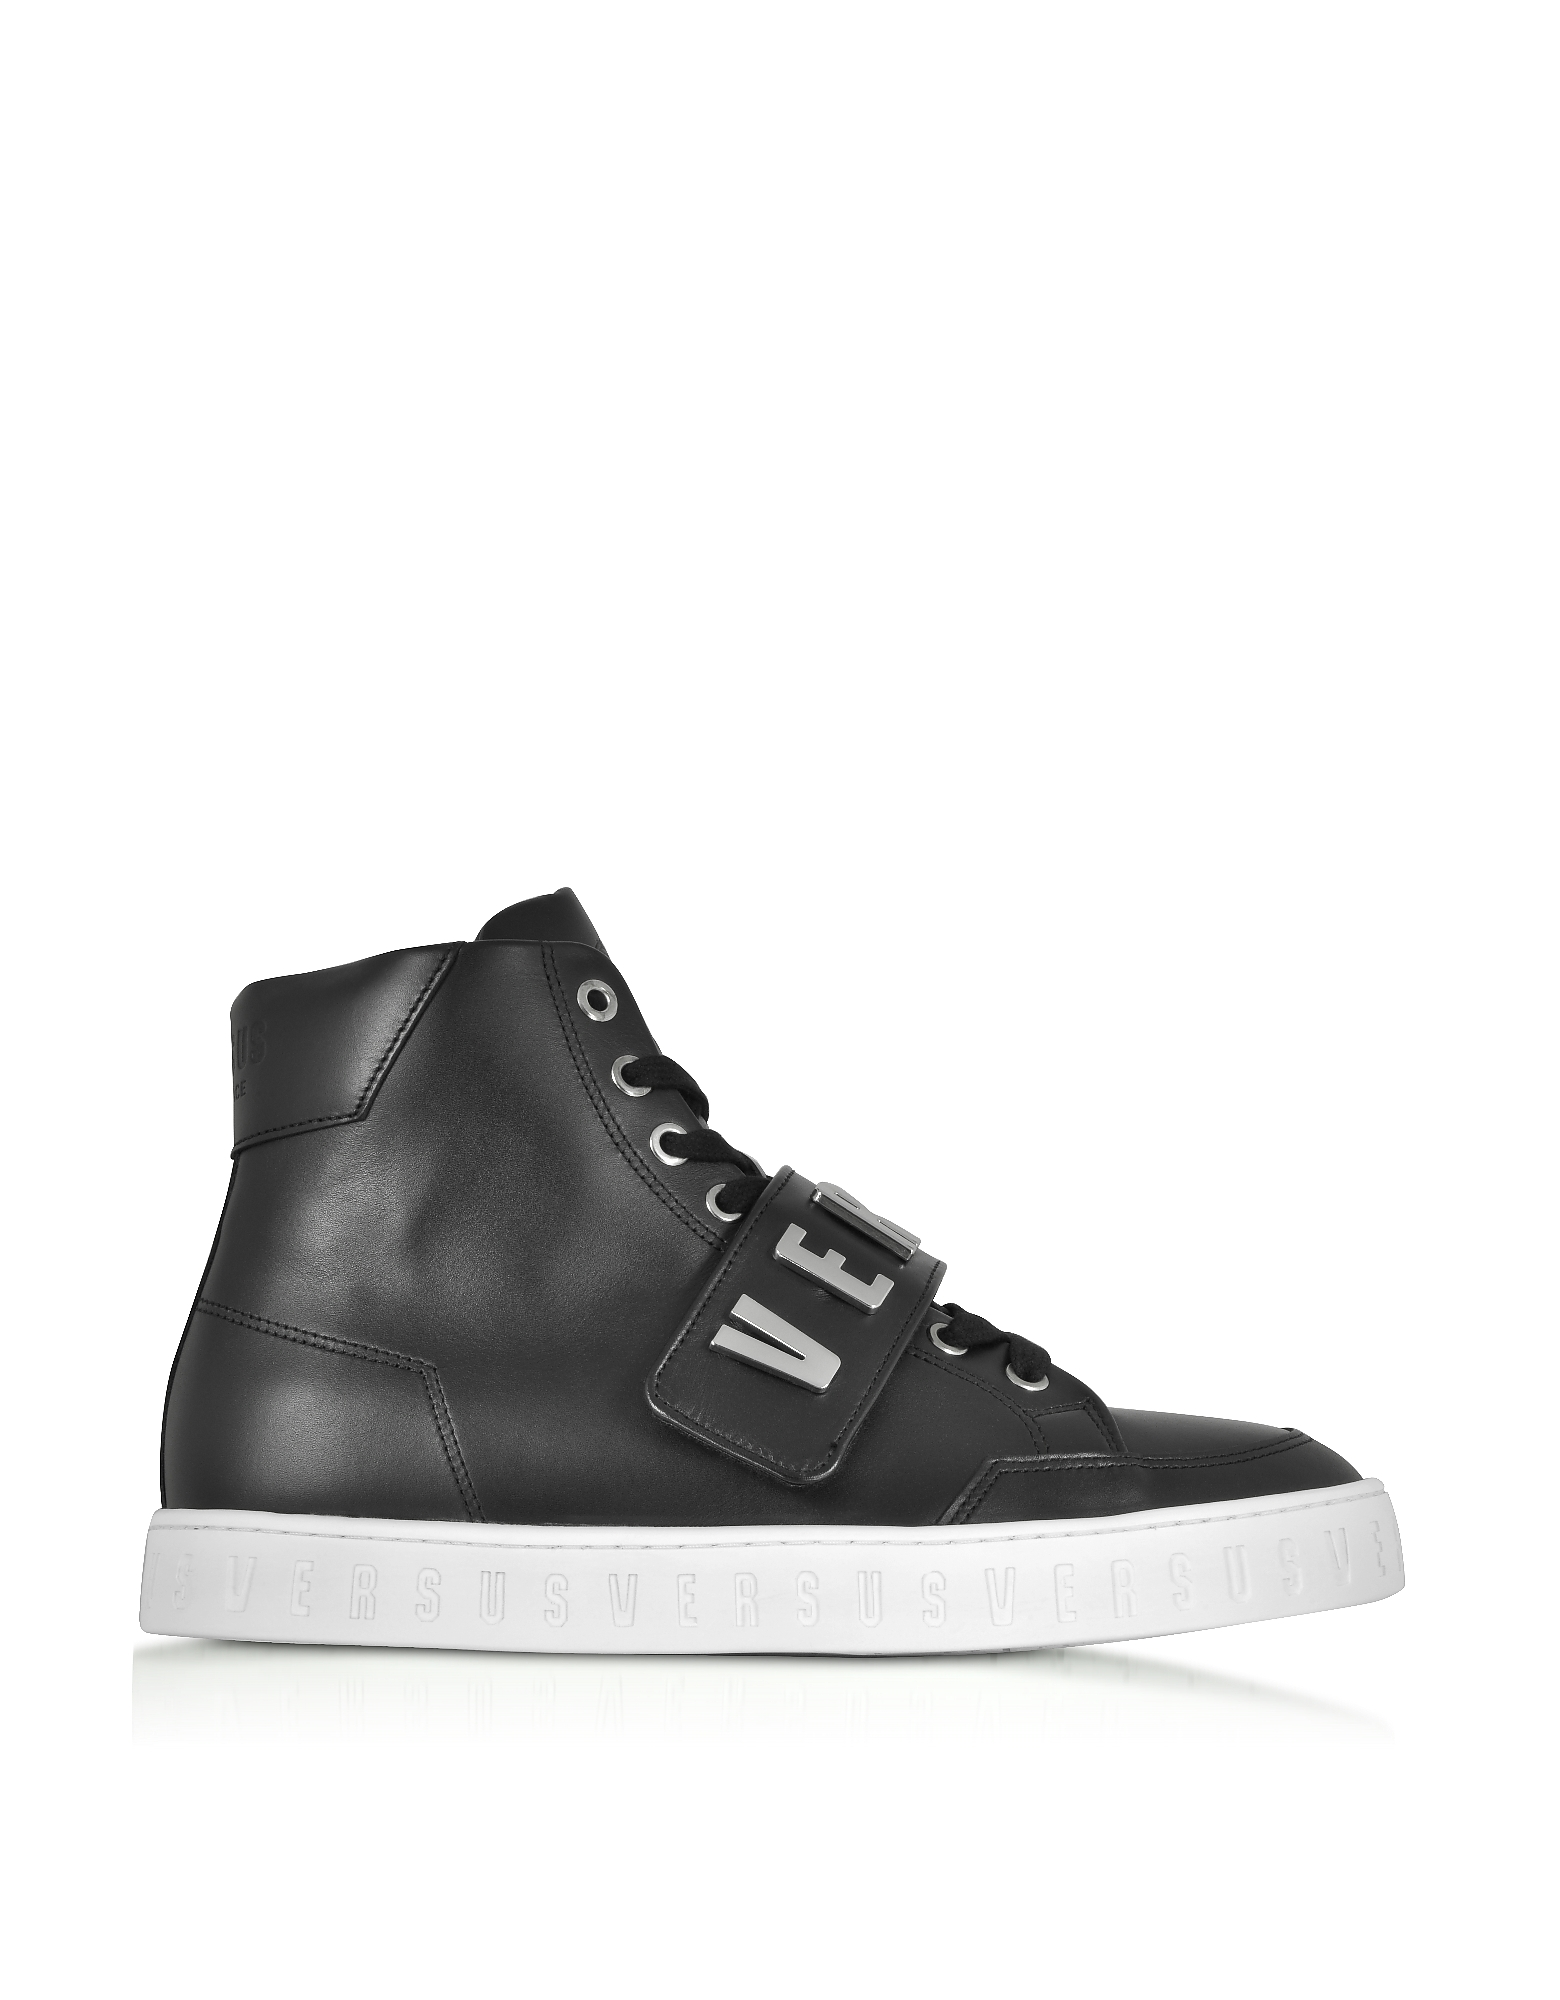 Versace Versus Shoes, Black Metal Logo Band High Top Men's Sneakers